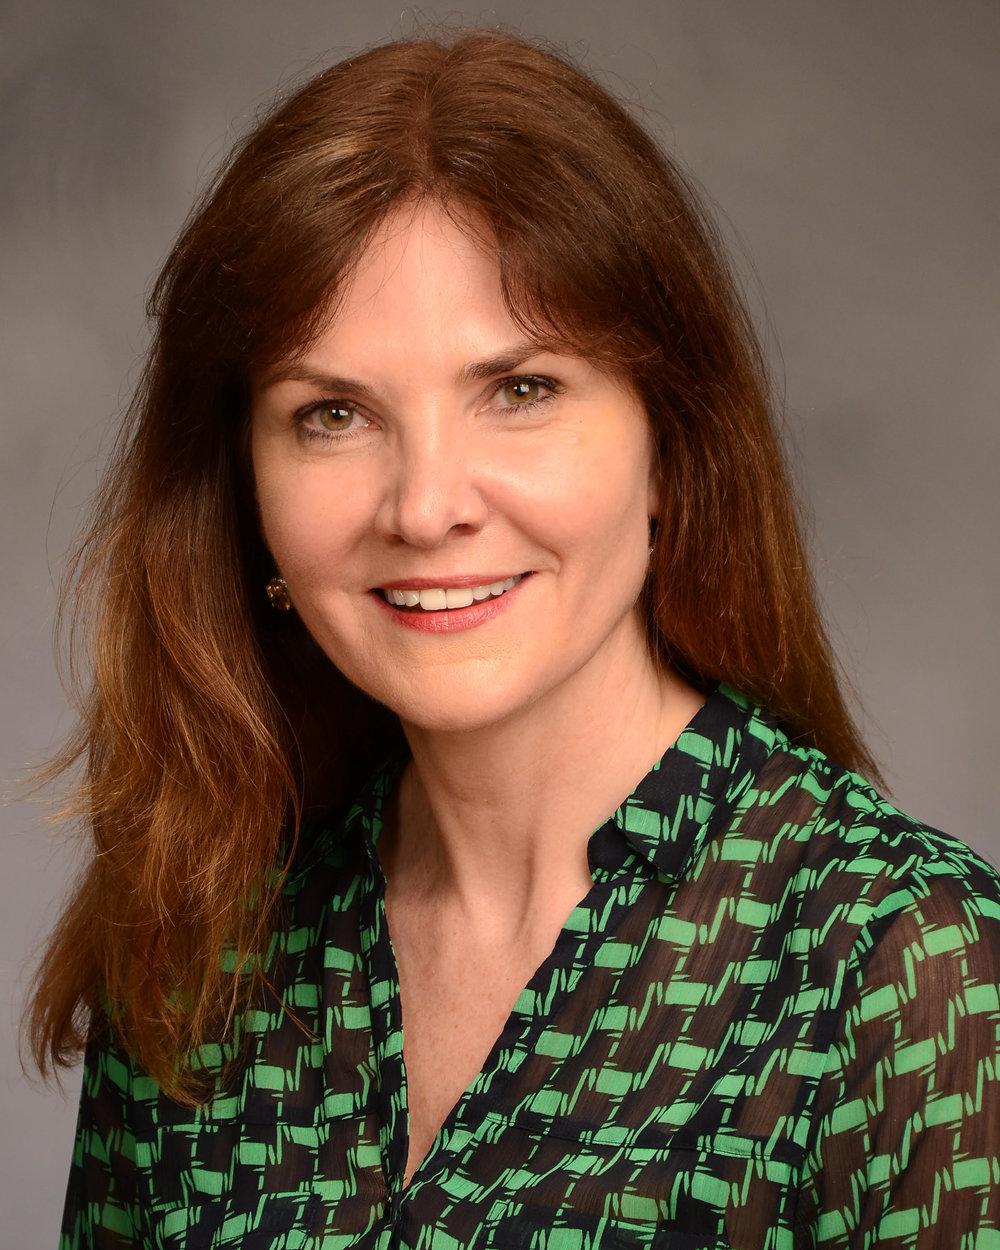 LMF President Melissa MacDonnell